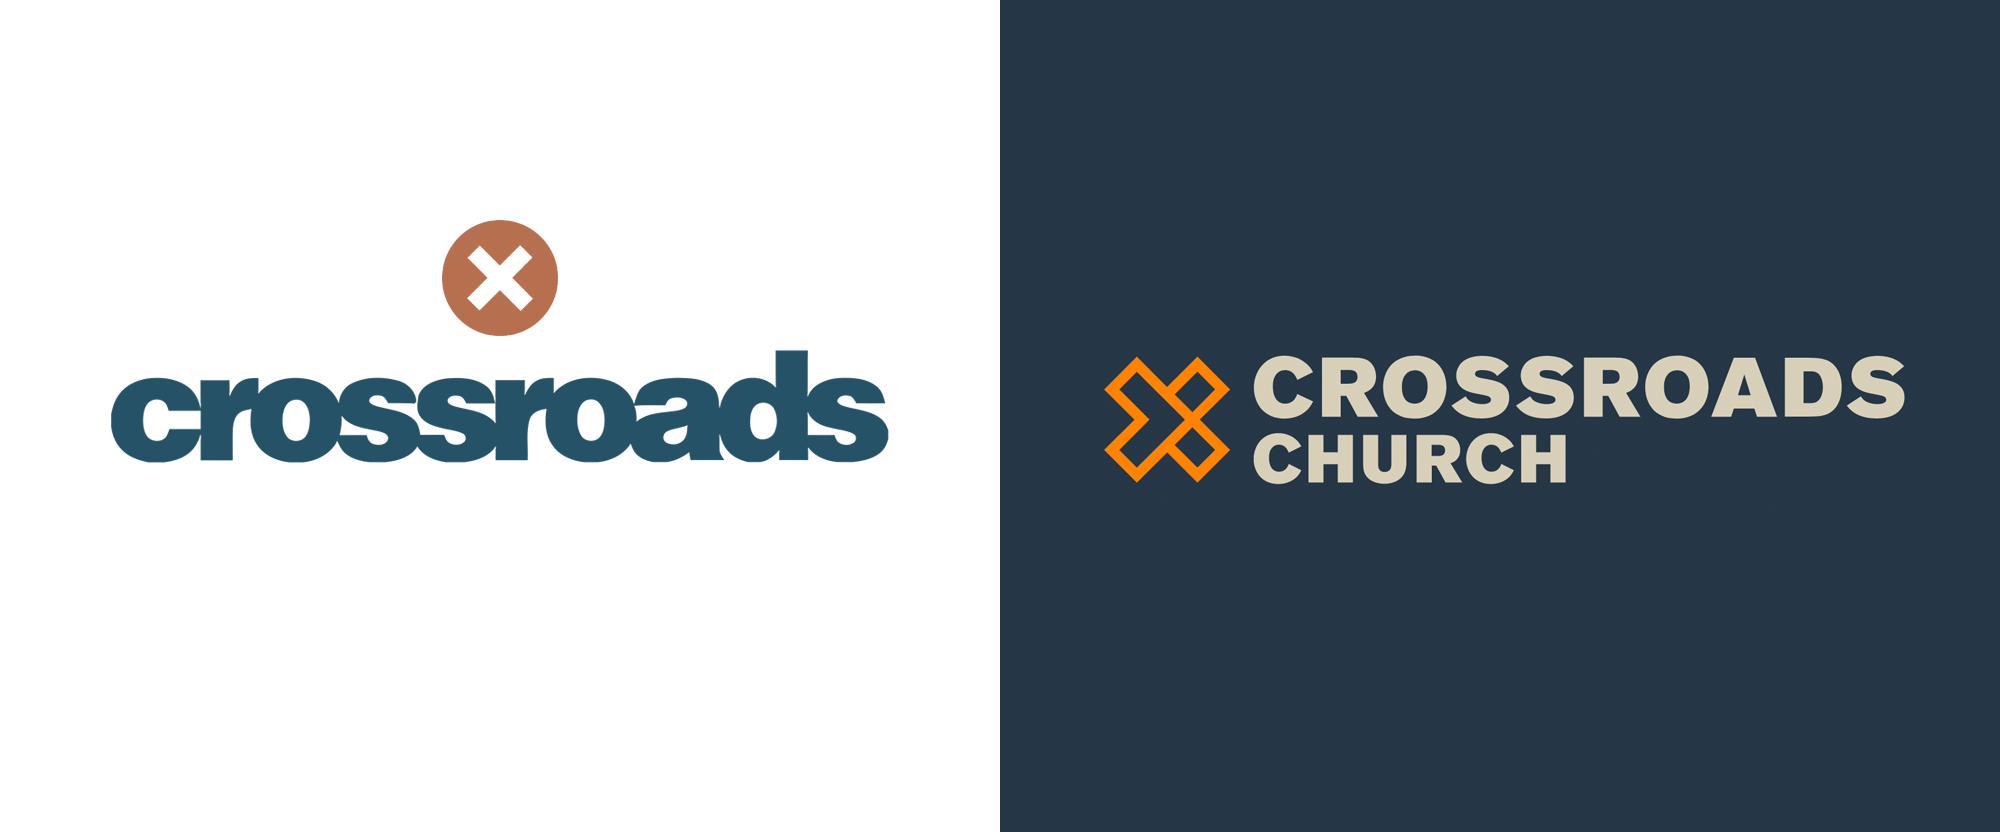 New Logo for Crossroads Church